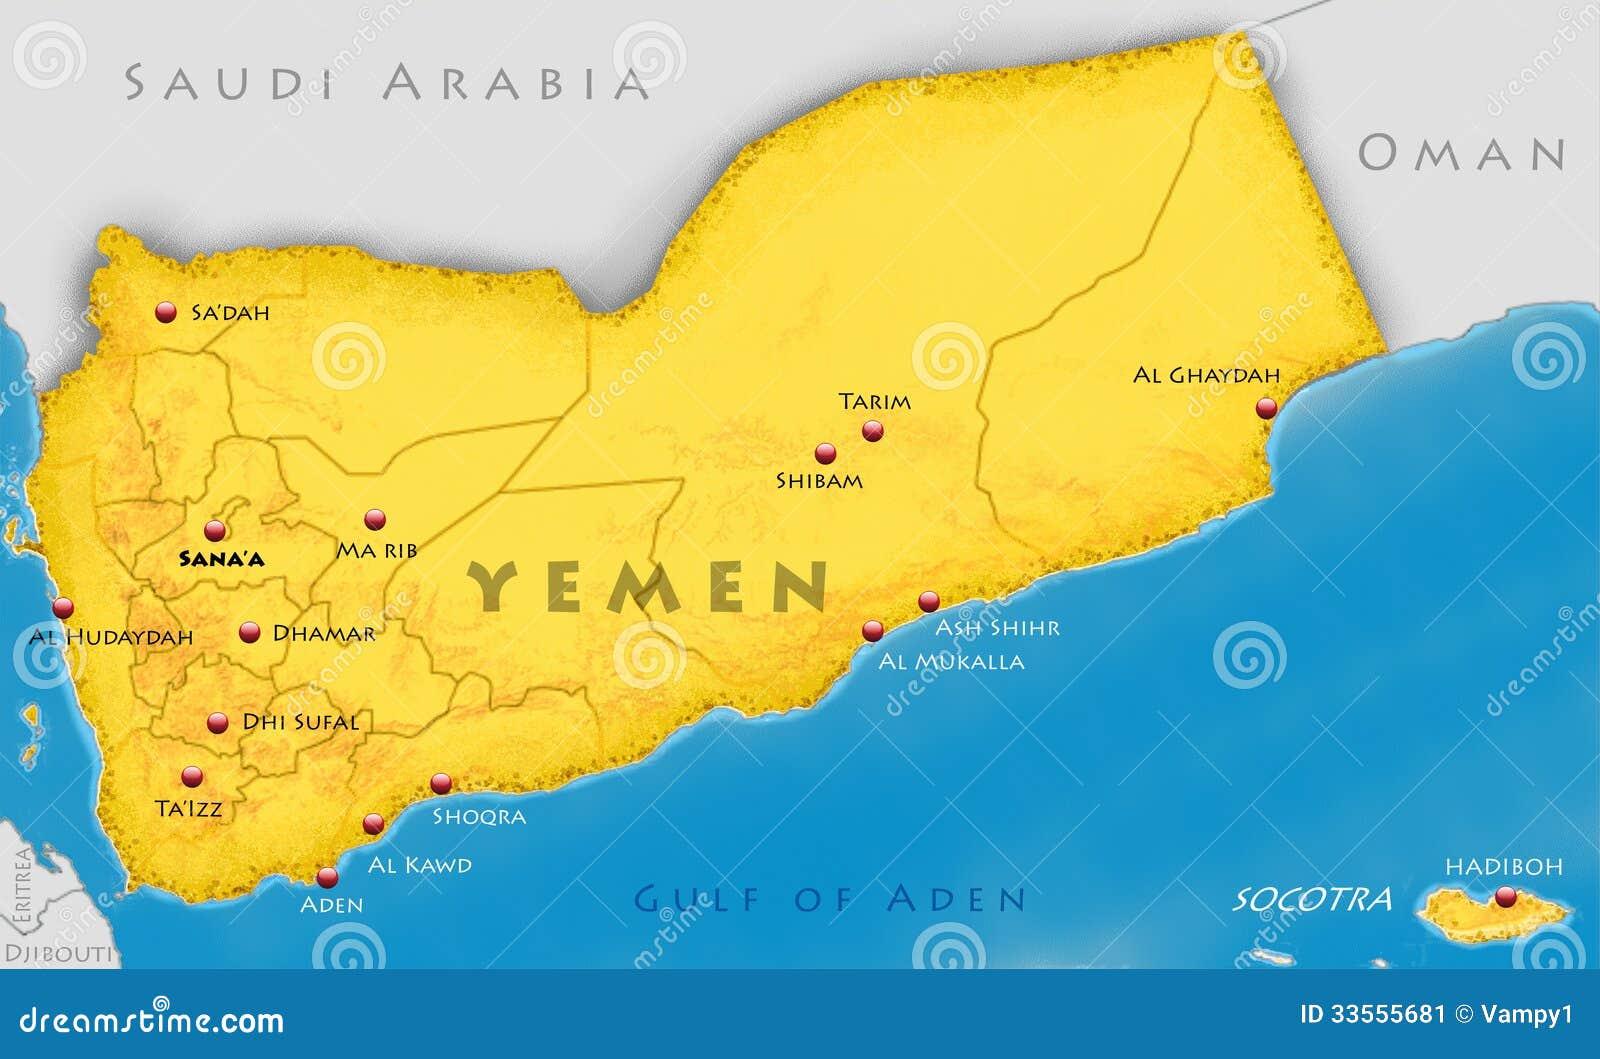 Republic Of Yemen Map Stock Image Image - Map of yemen